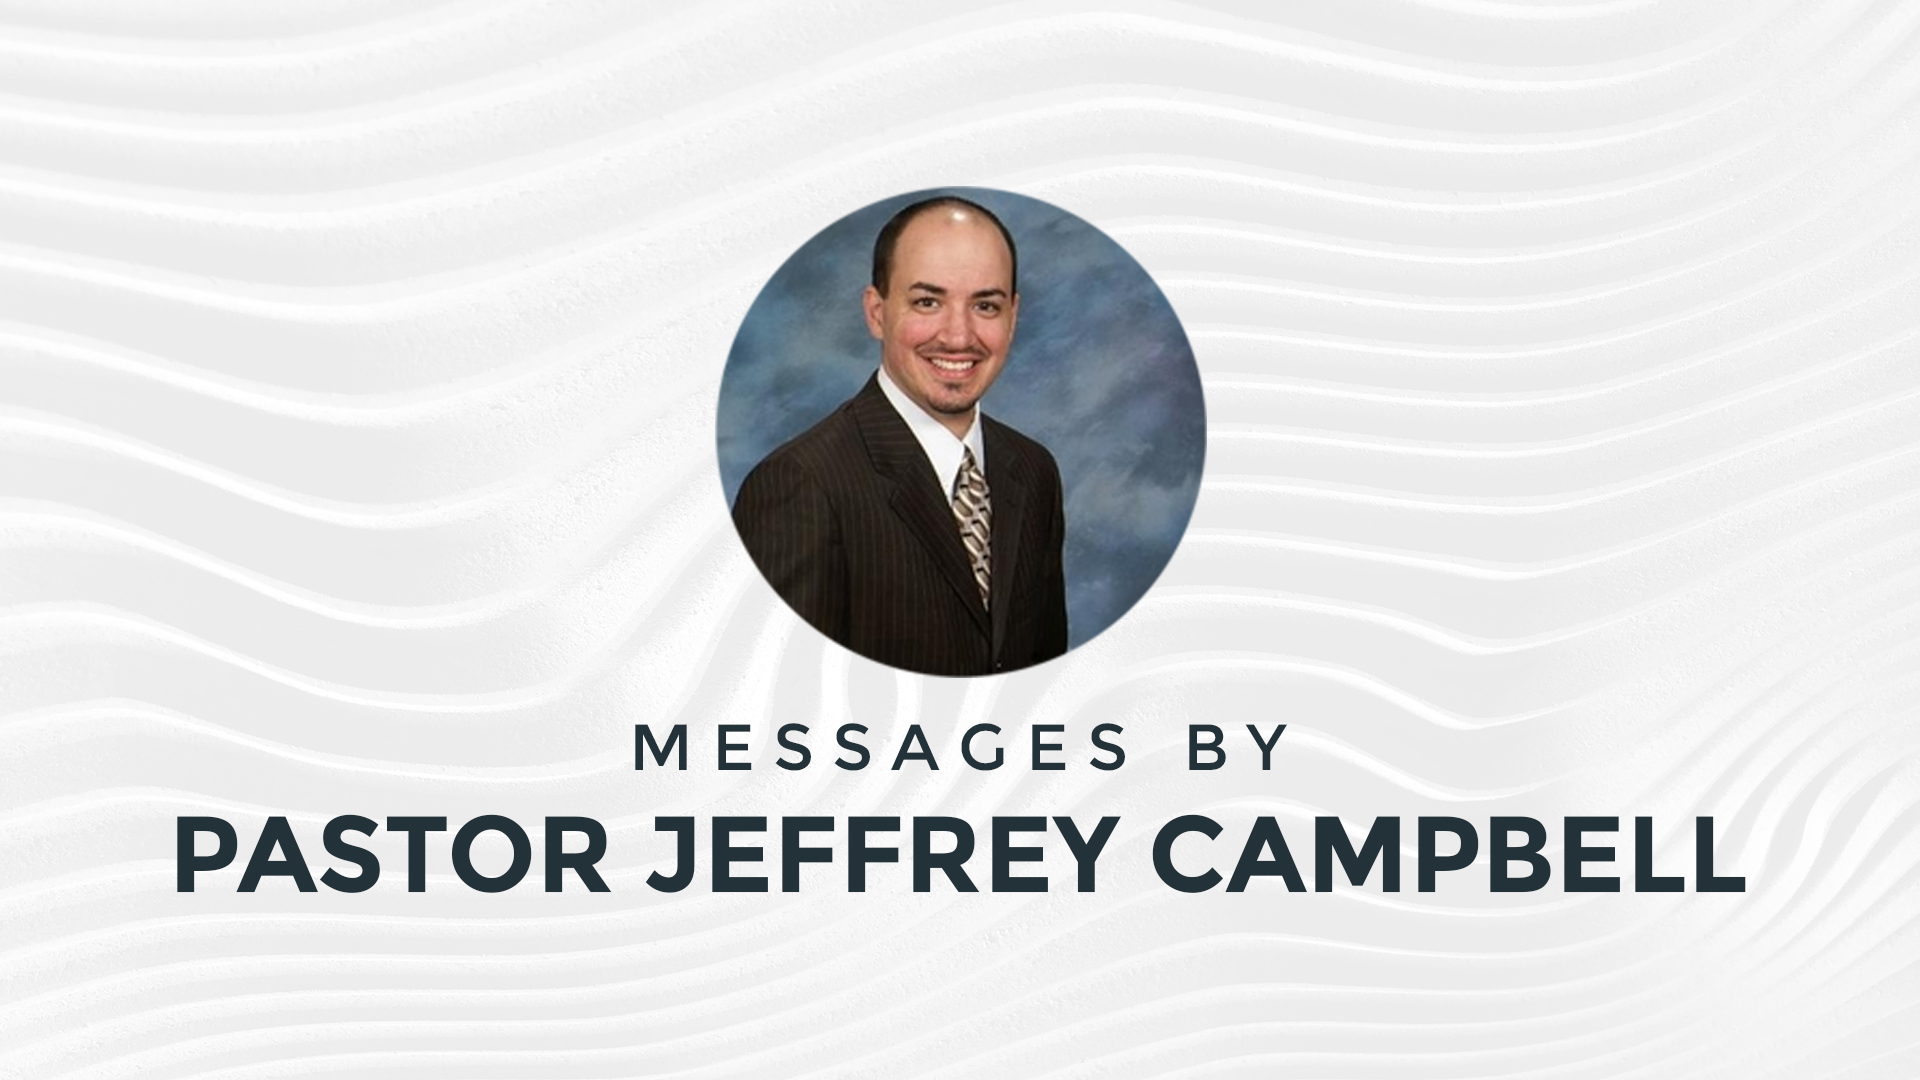 JefferyCampbell